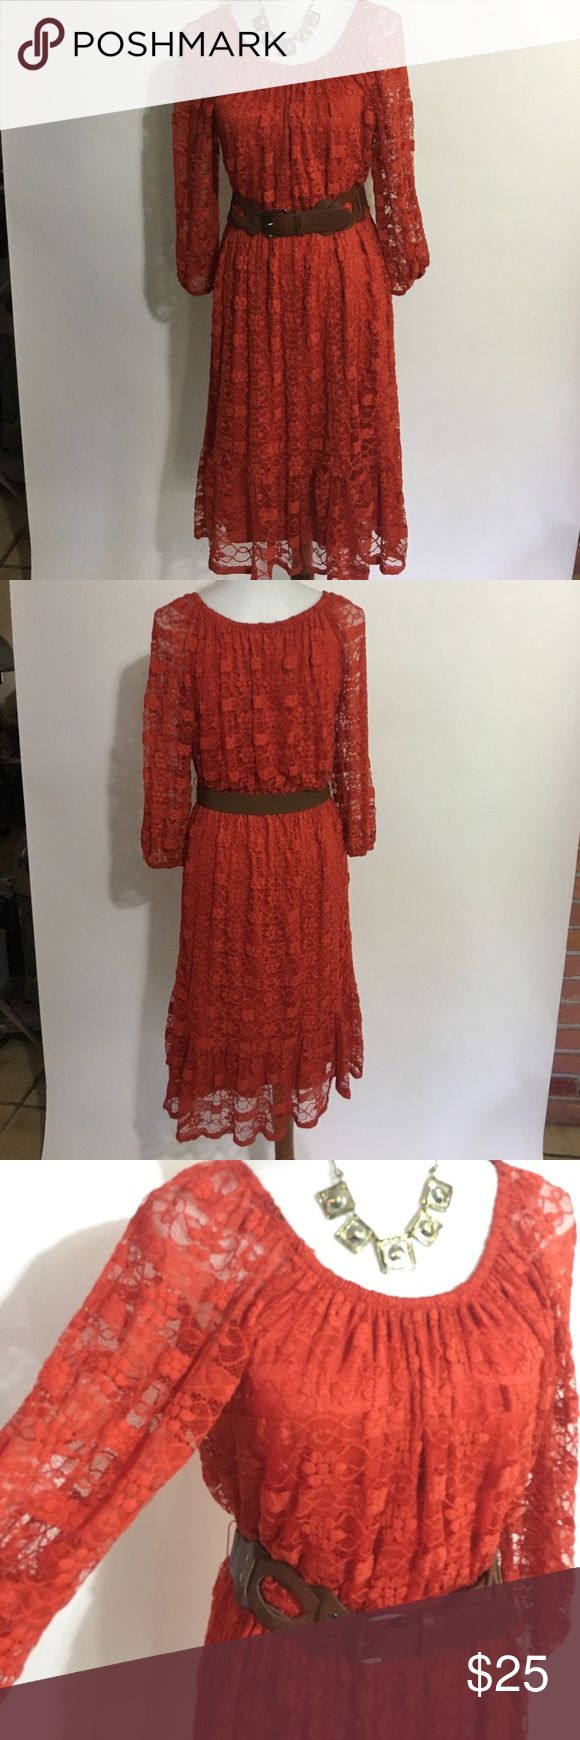 Orange lace dress with brown belt. Burnt Orange lace dress with brown belt. Dresses